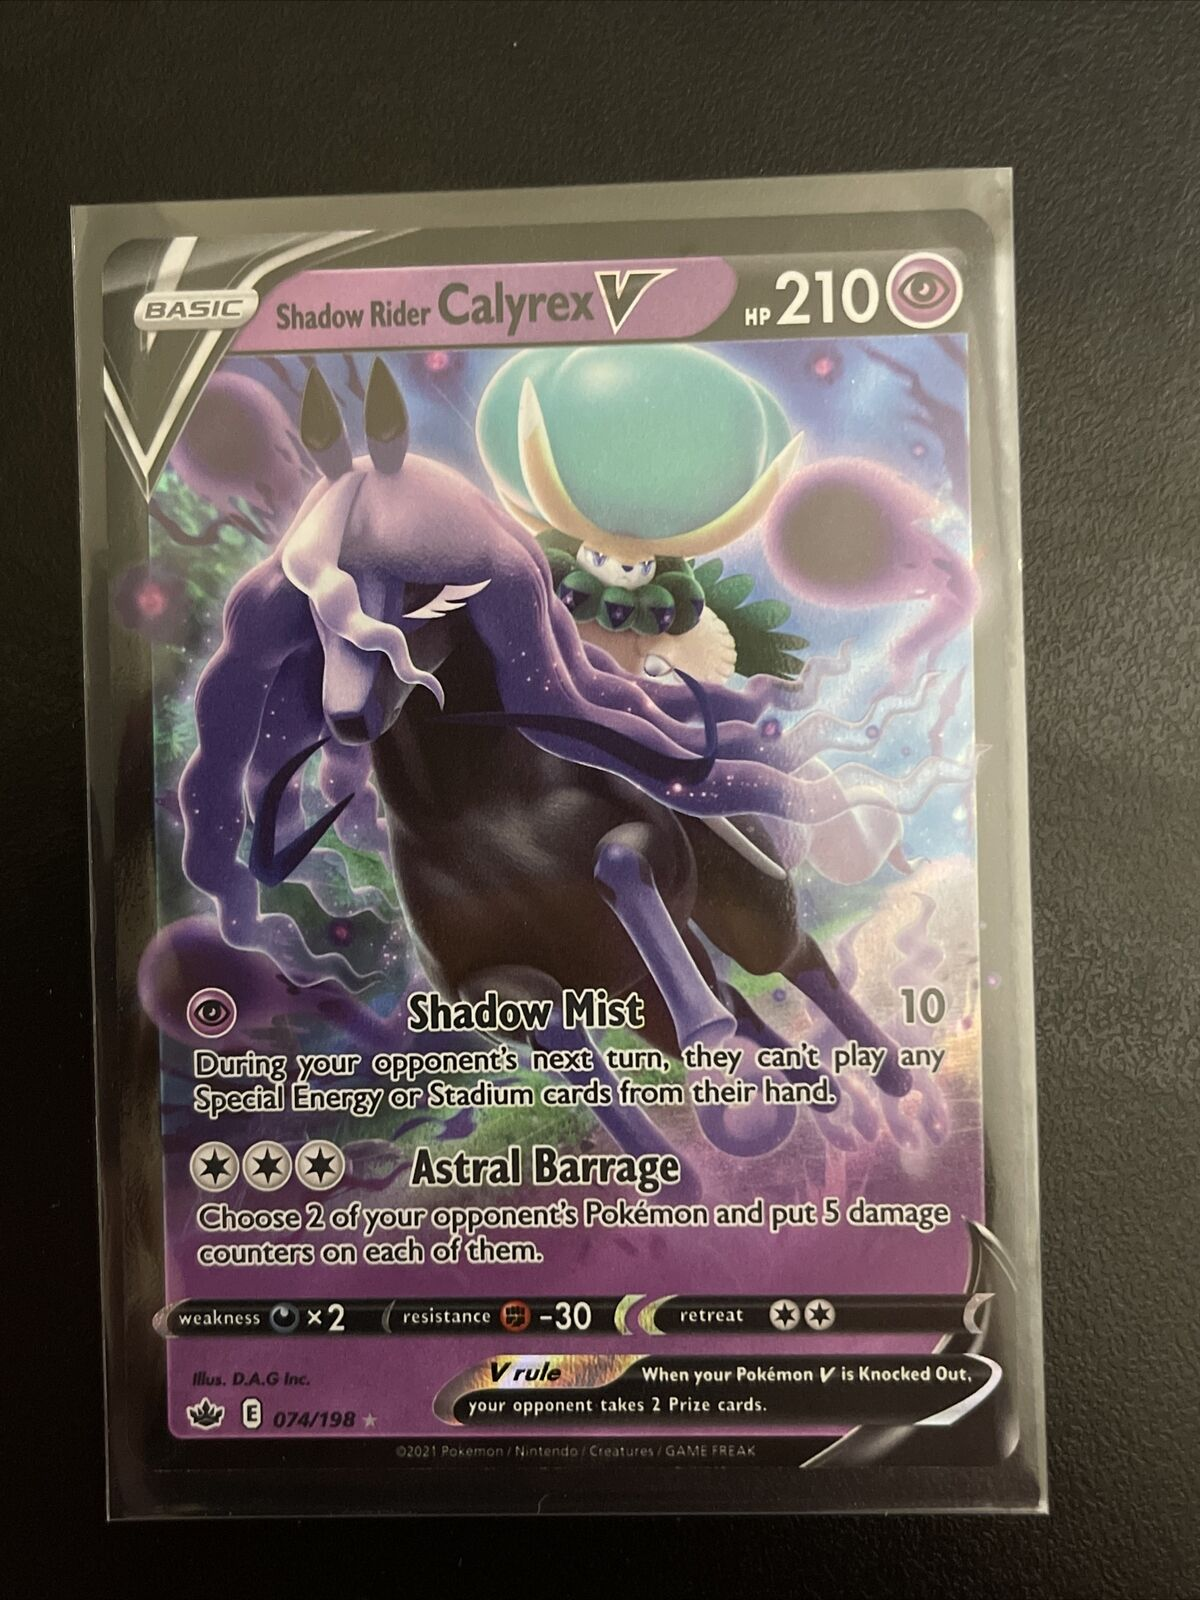 Pokemon TCG - Chilling Reign - Shadow Rider Calyrex V Rare Holo 074/198